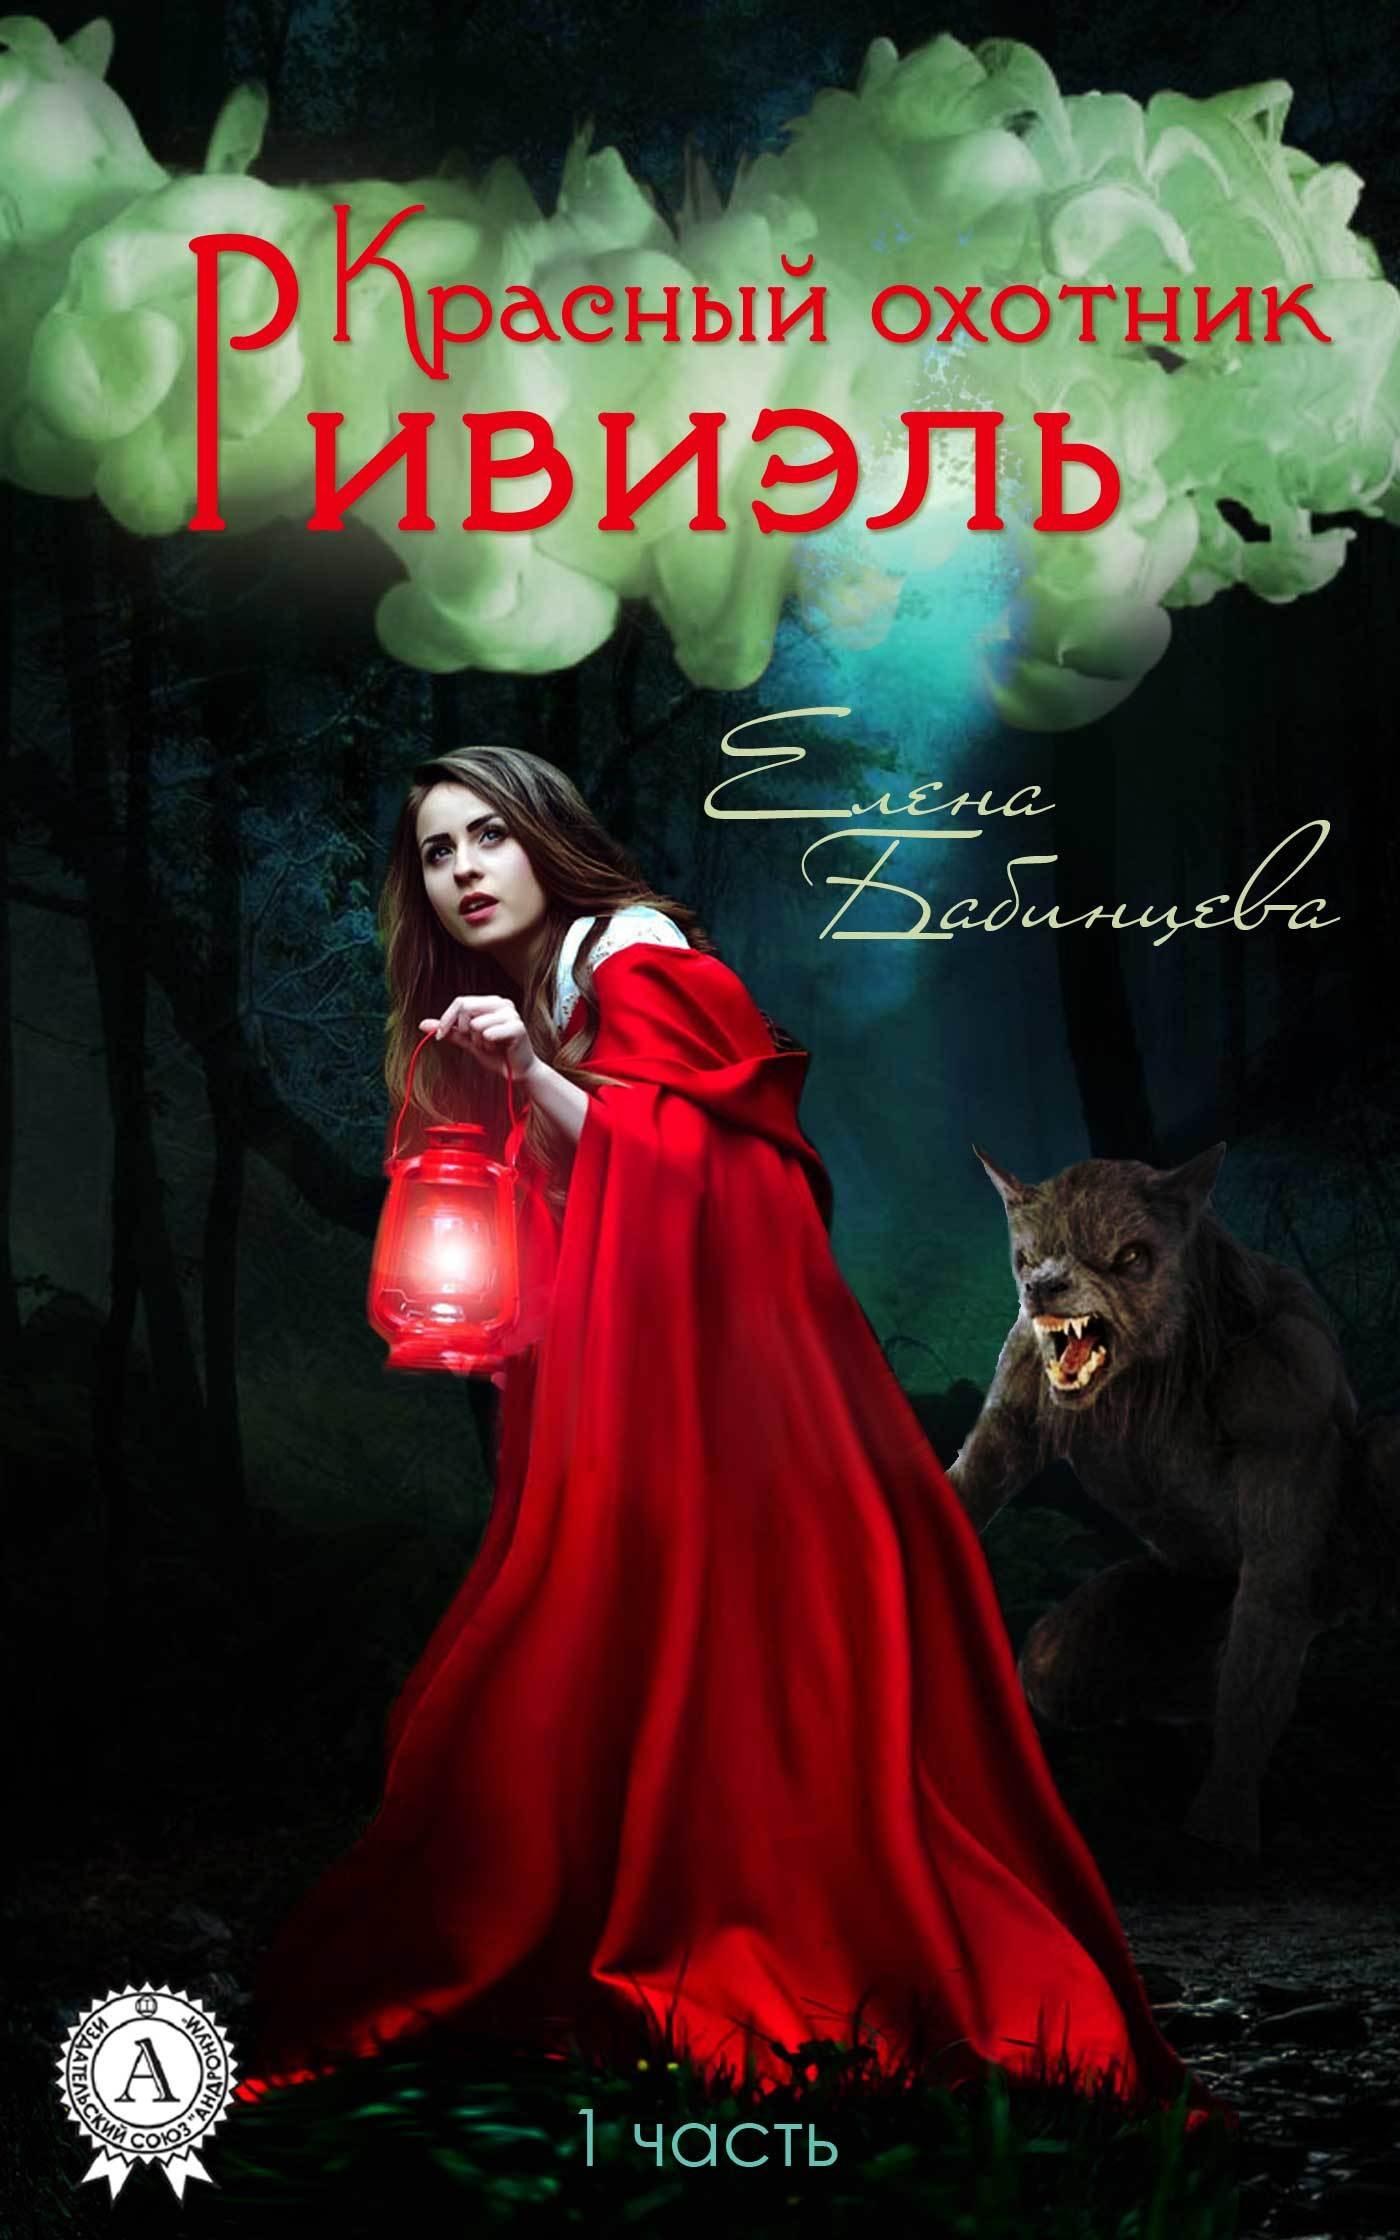 Елена Бабинцева